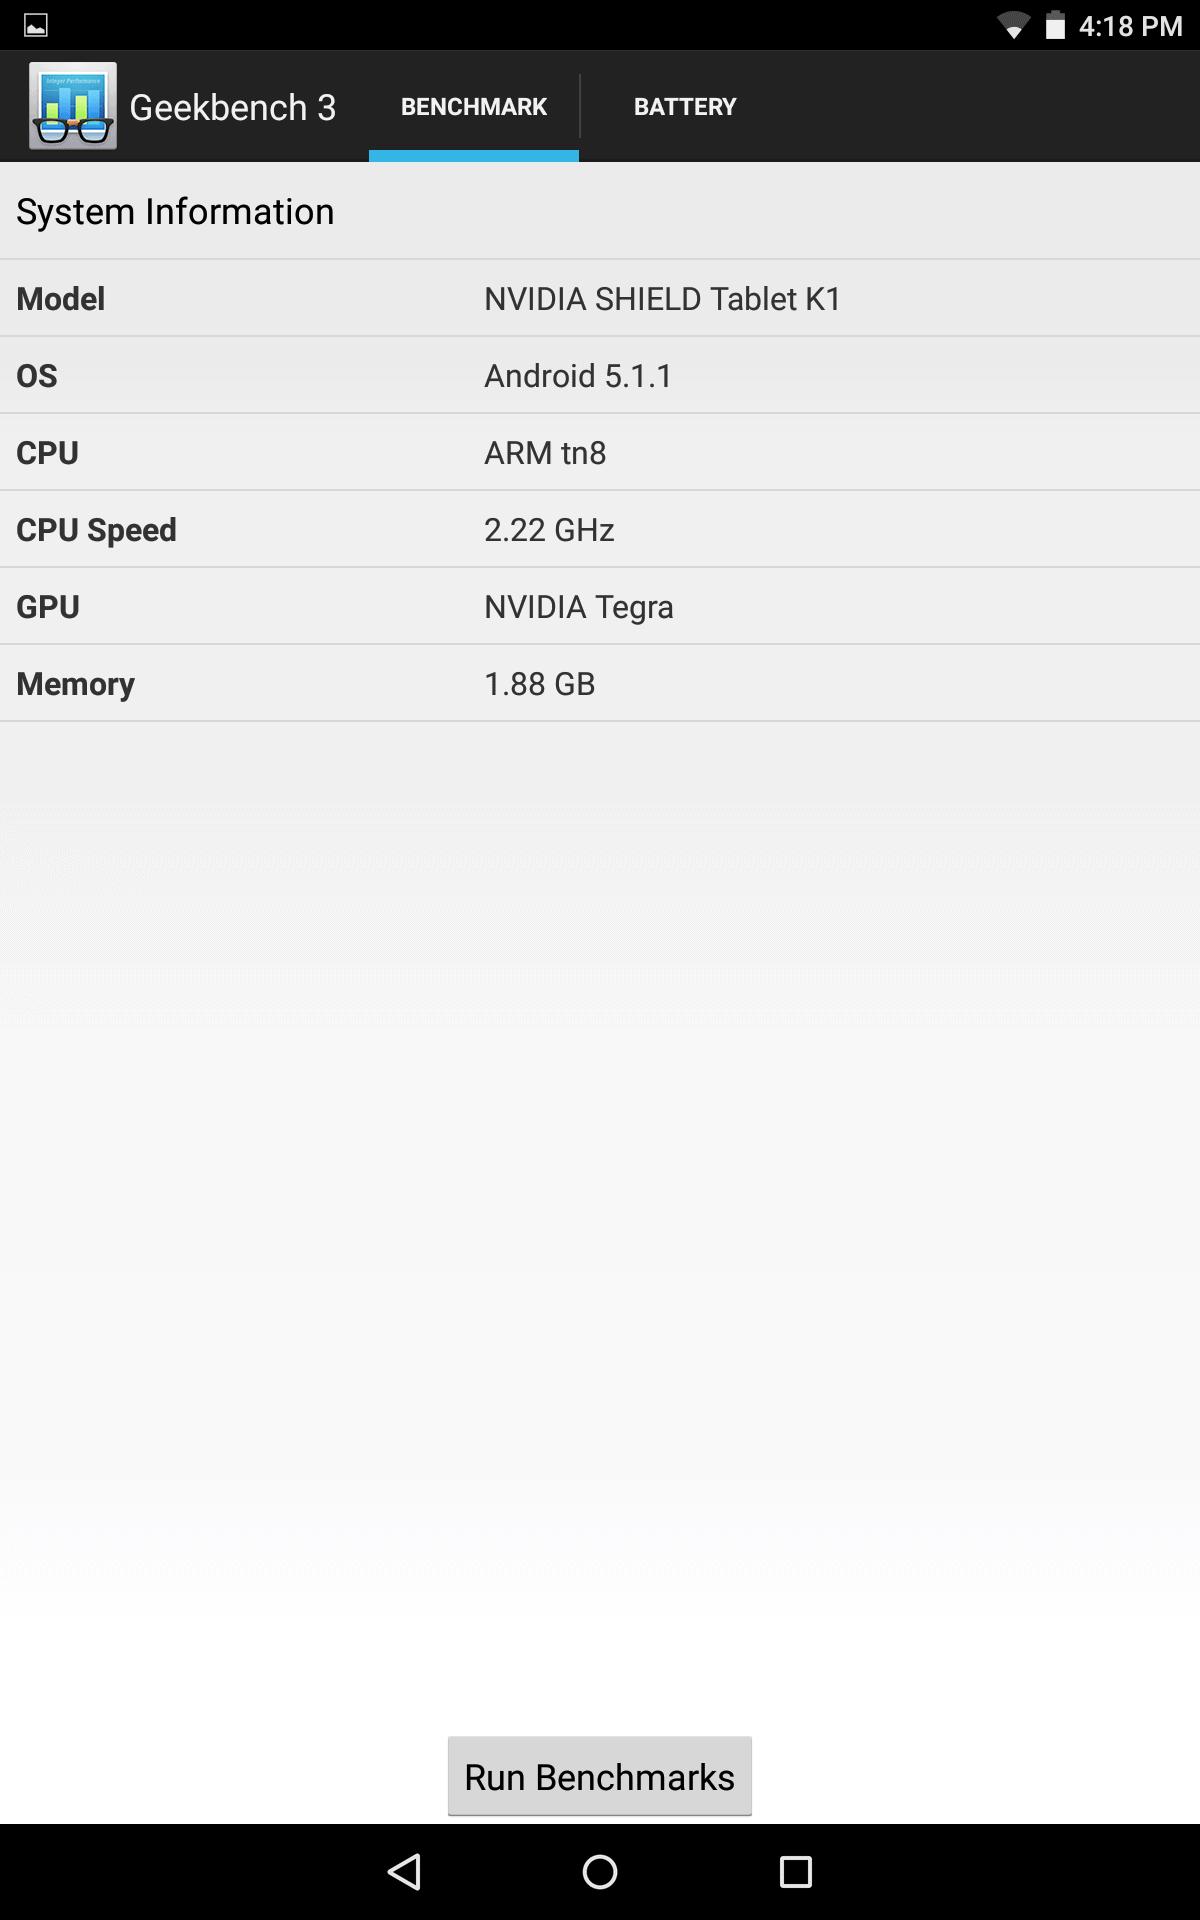 Screenshot 2015 11 13 16 18 14